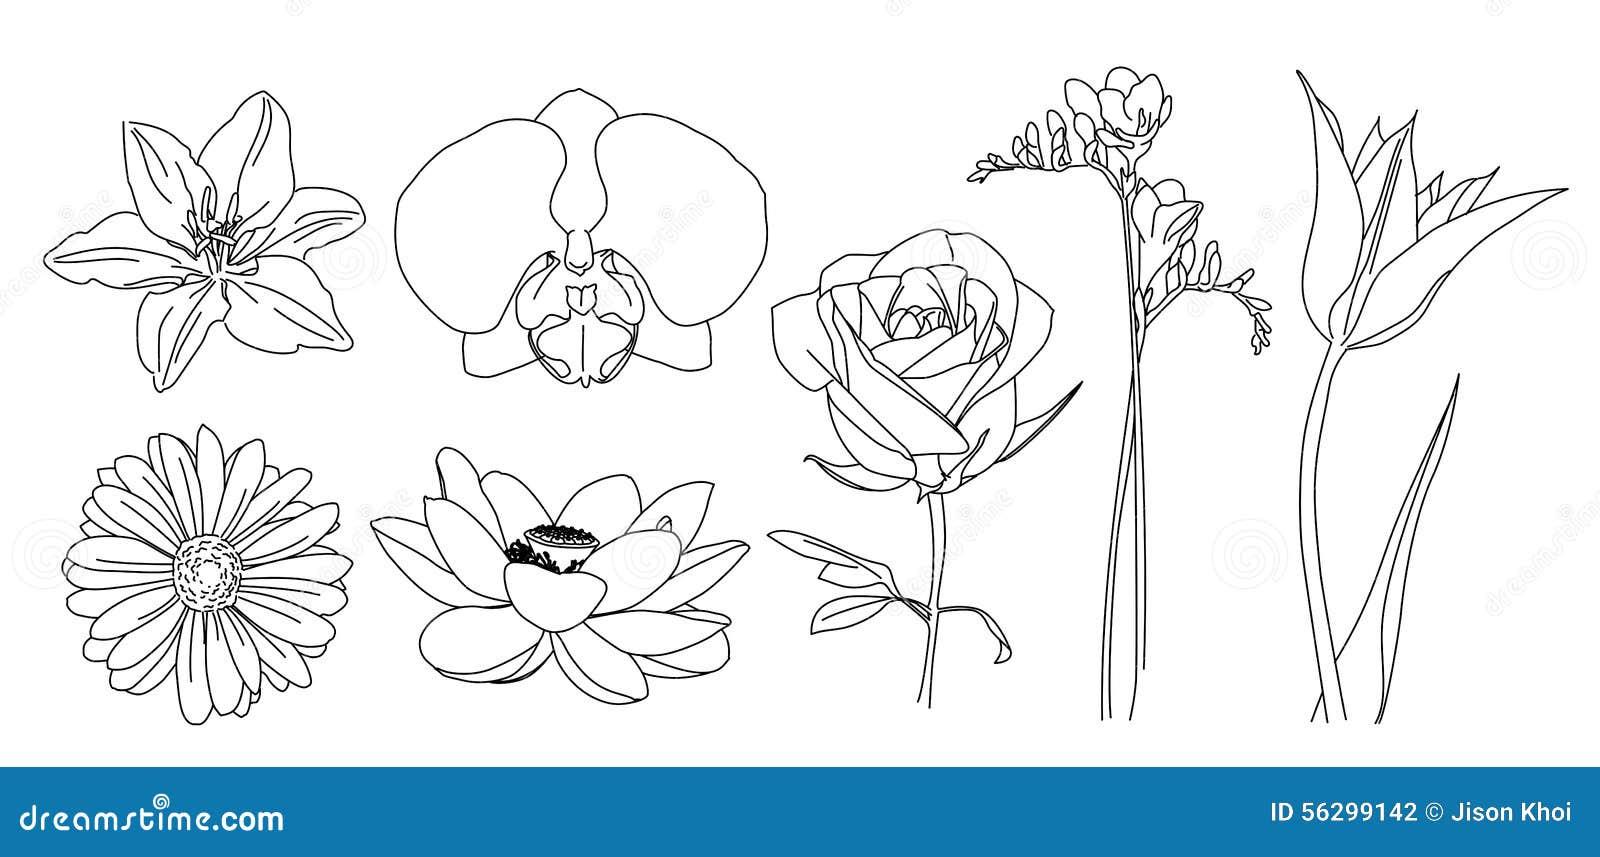 Flowers vector outline stock illustration. Illustration of